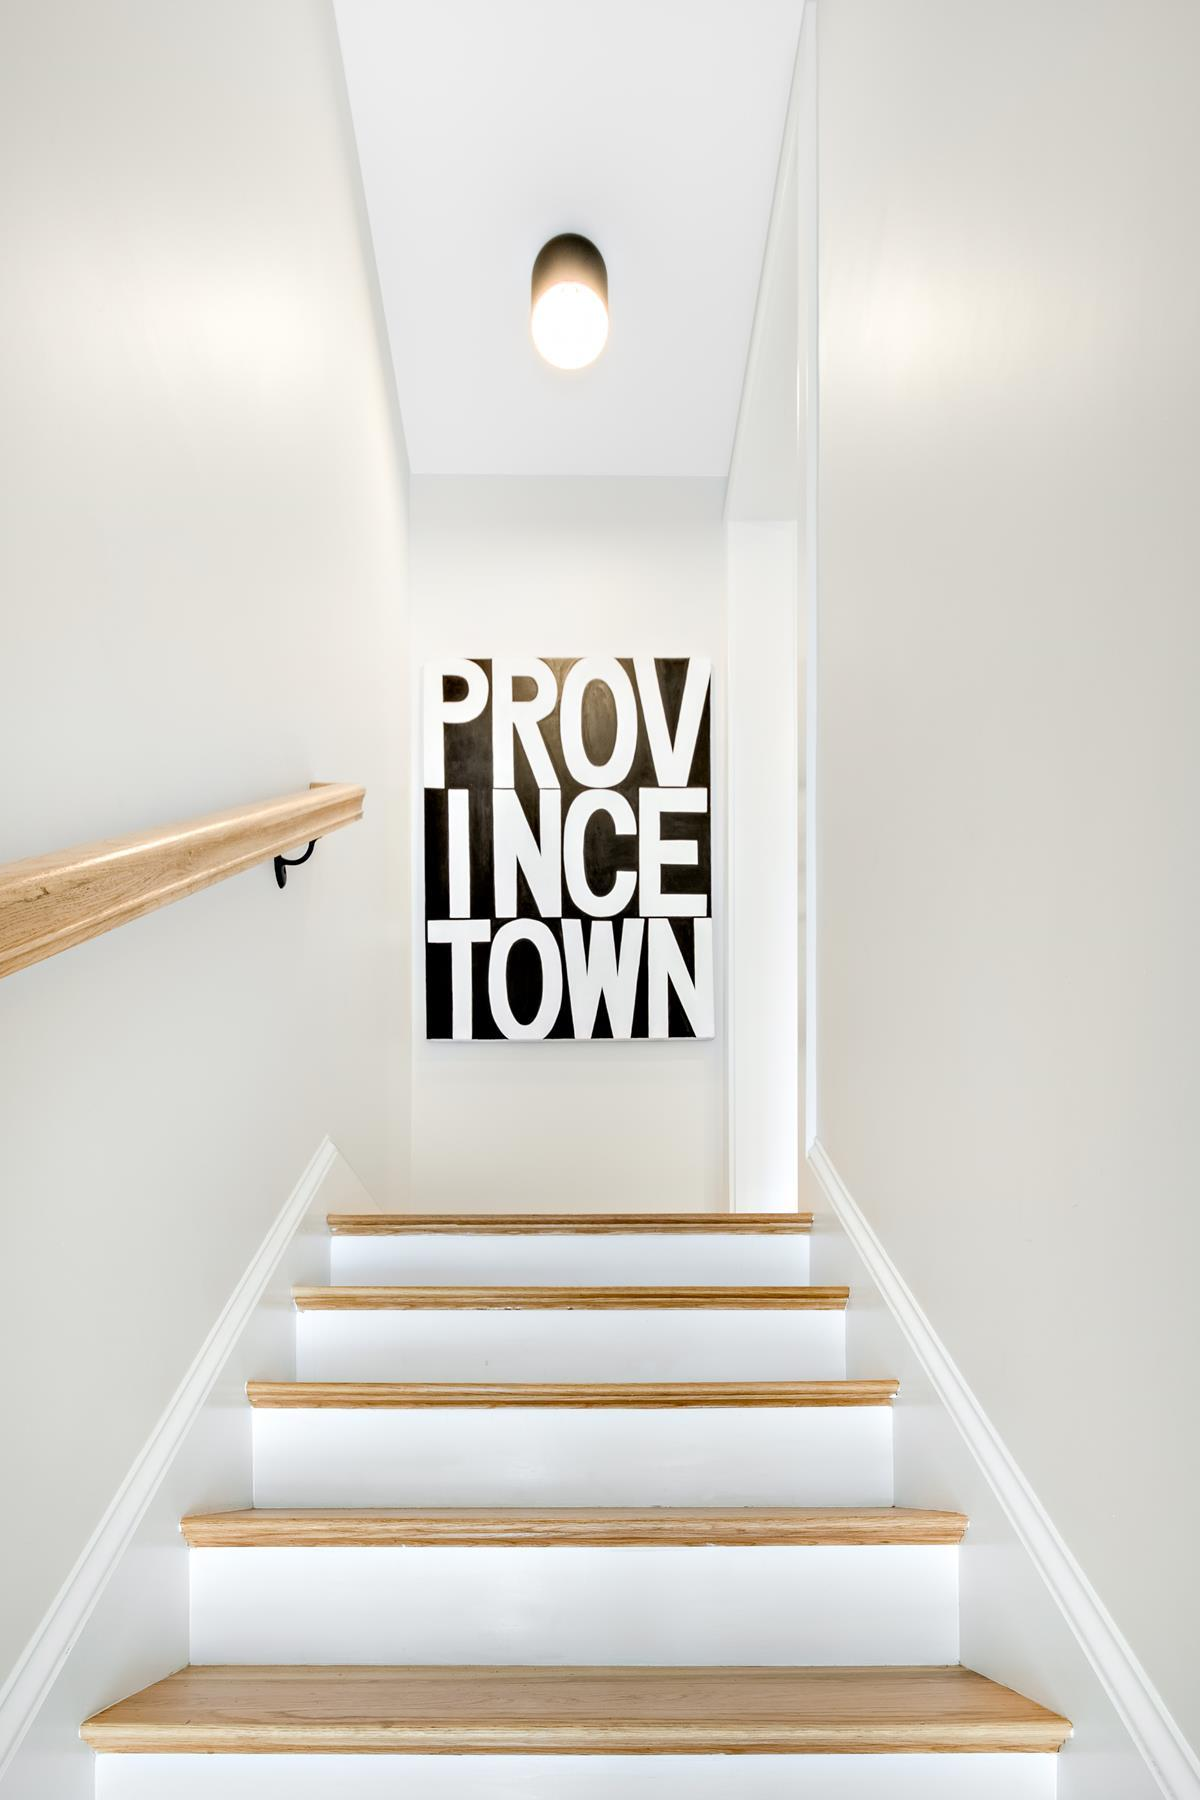 350 Bradford Provincetown, MA 02657